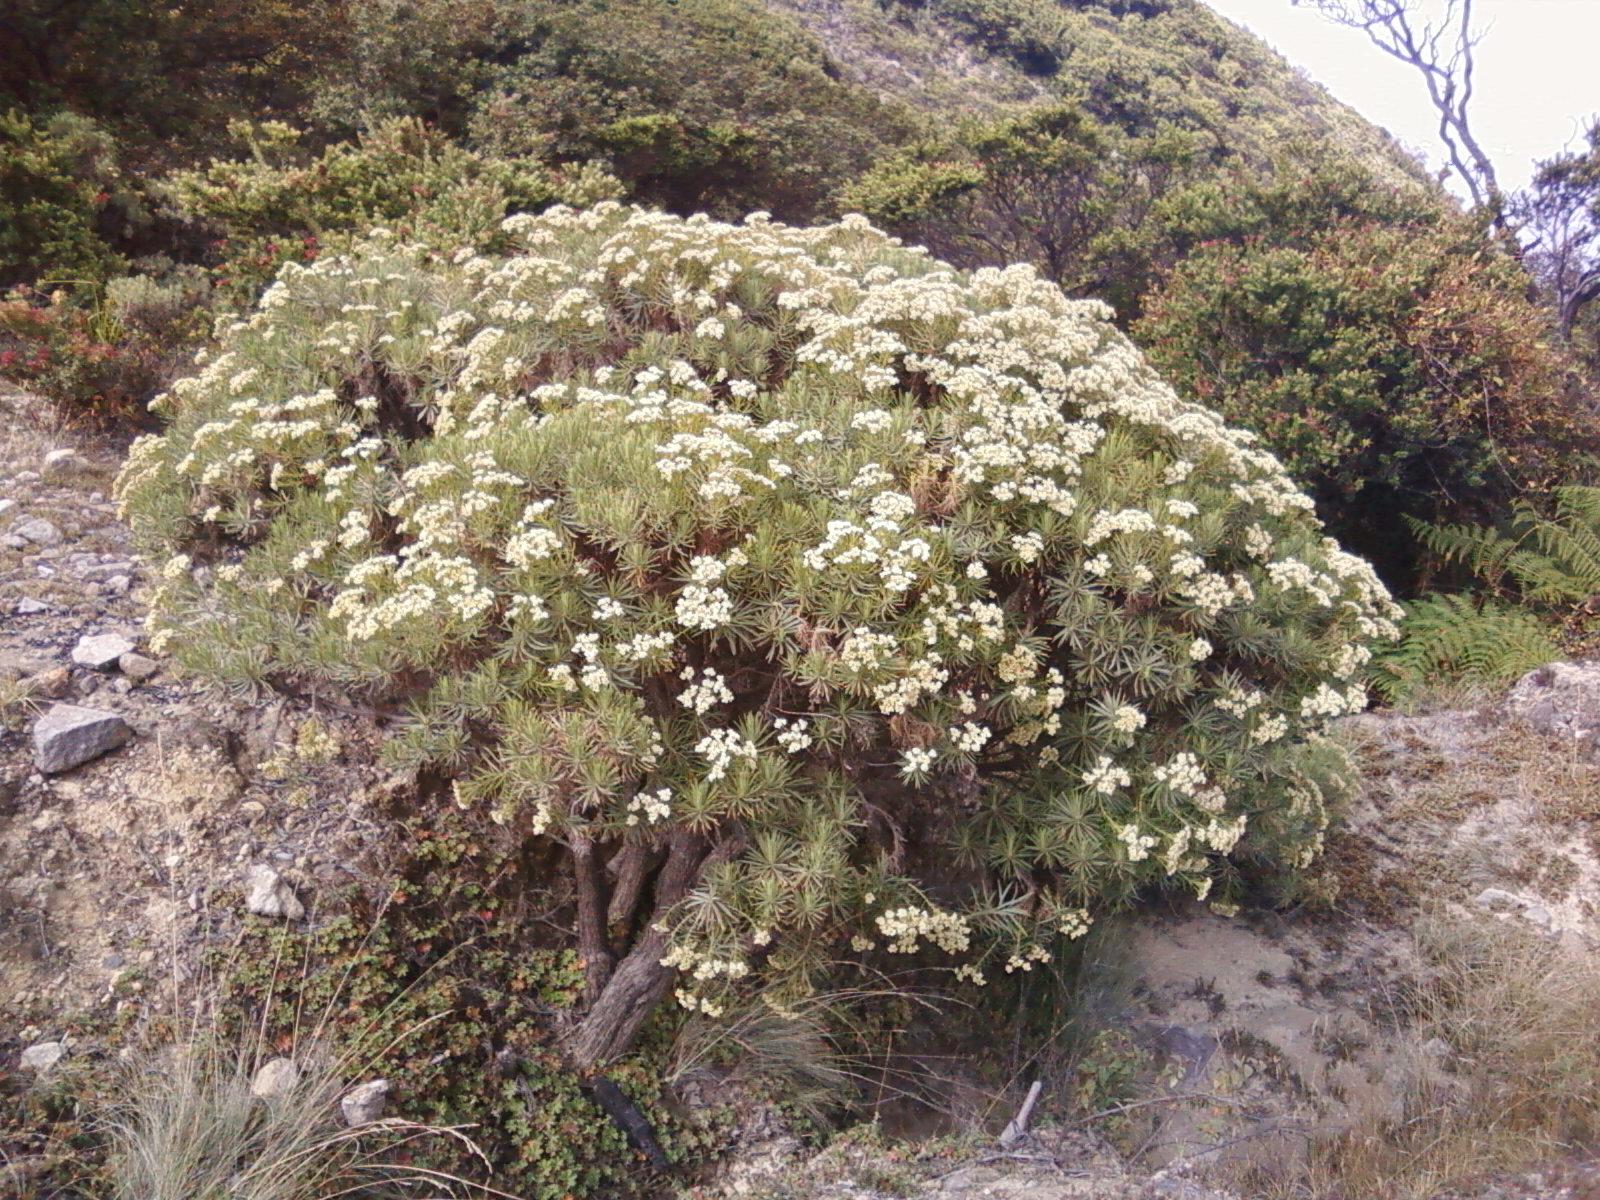 Edelweis Bunga Abadi Lambang Ketulusan Dan Pengorbanan Cinta